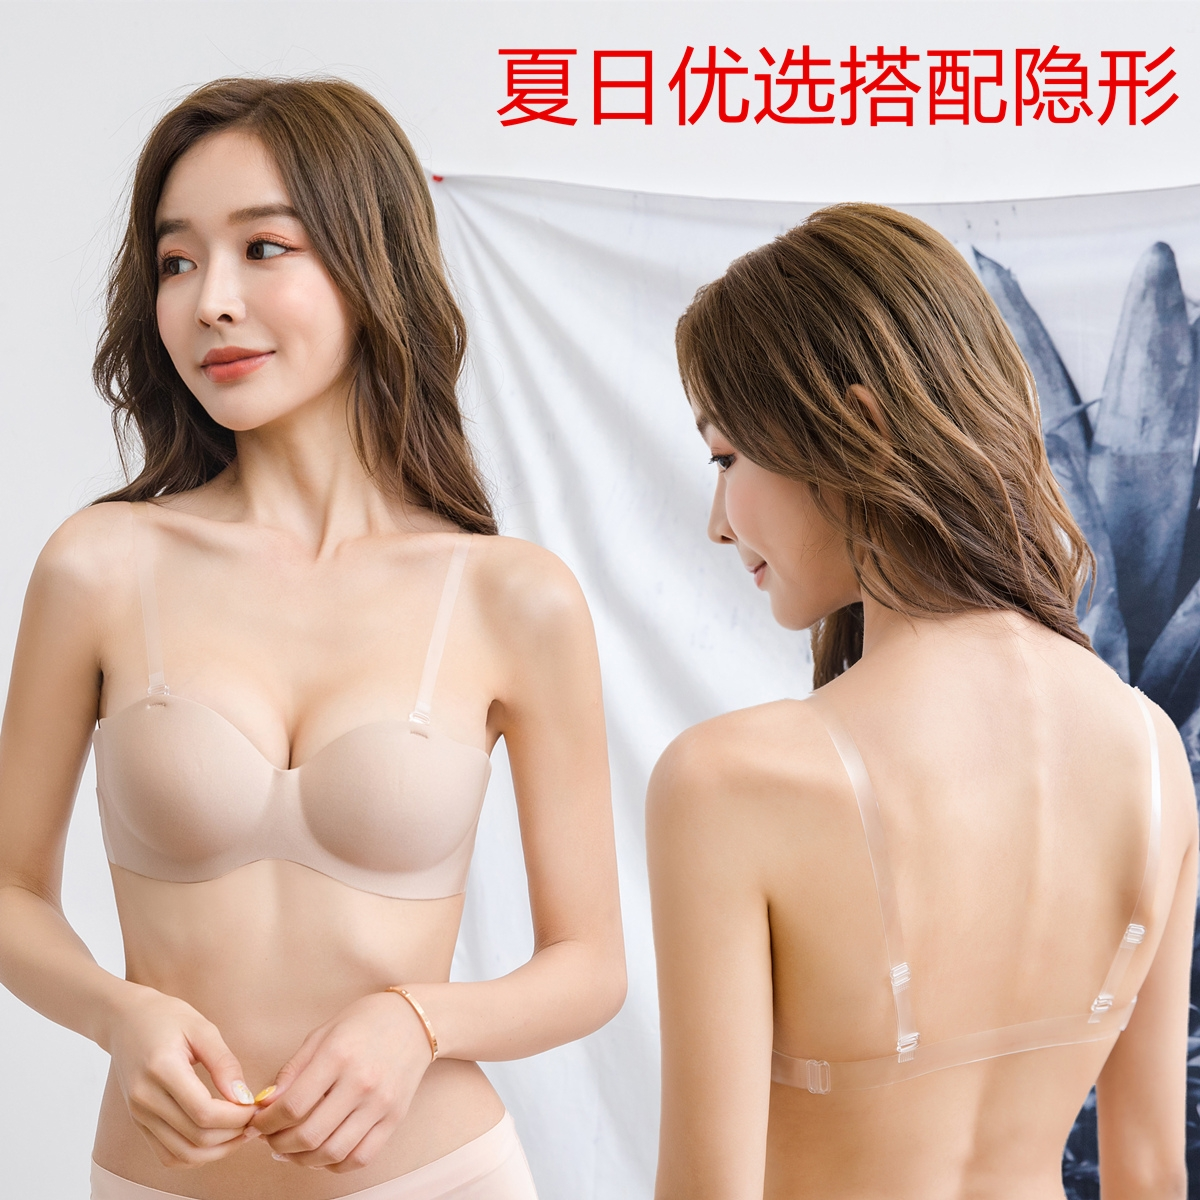 Victoria Strapless underwear gathers beautiful back, open back, invisible bra, wedding dress, the secret of bra